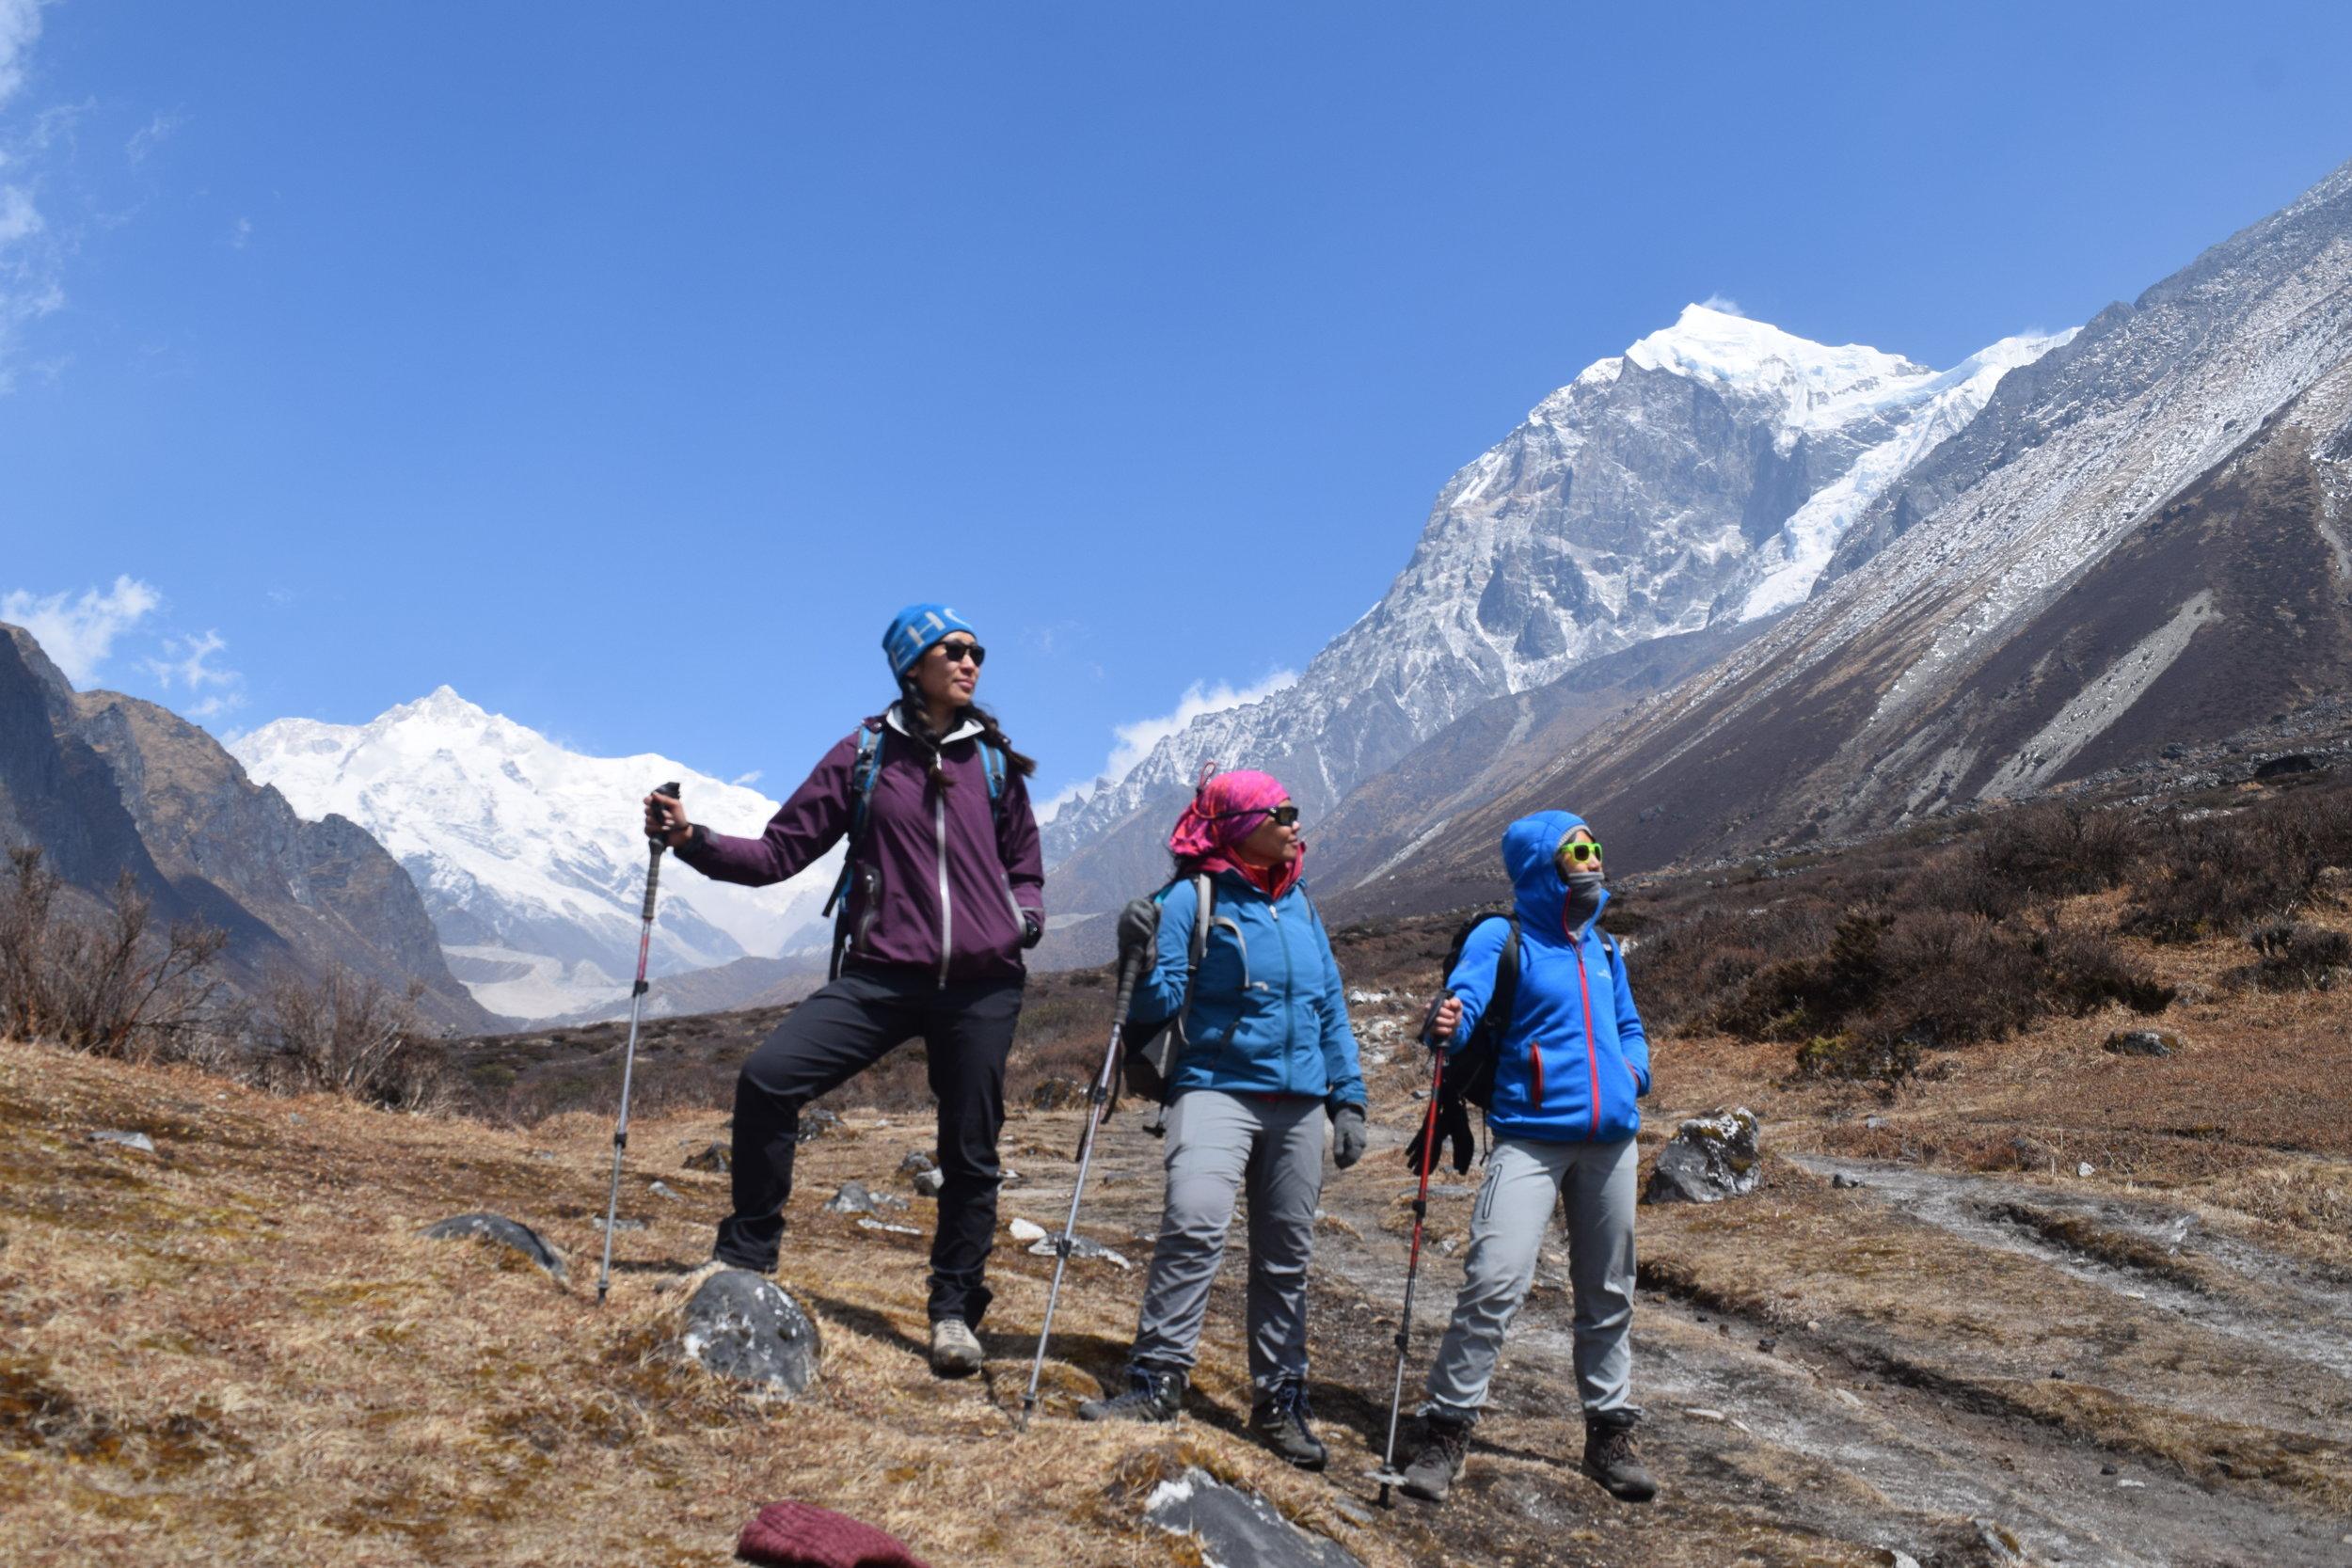 Exploring the Kanchenchunga base camp in Sikkim, India.